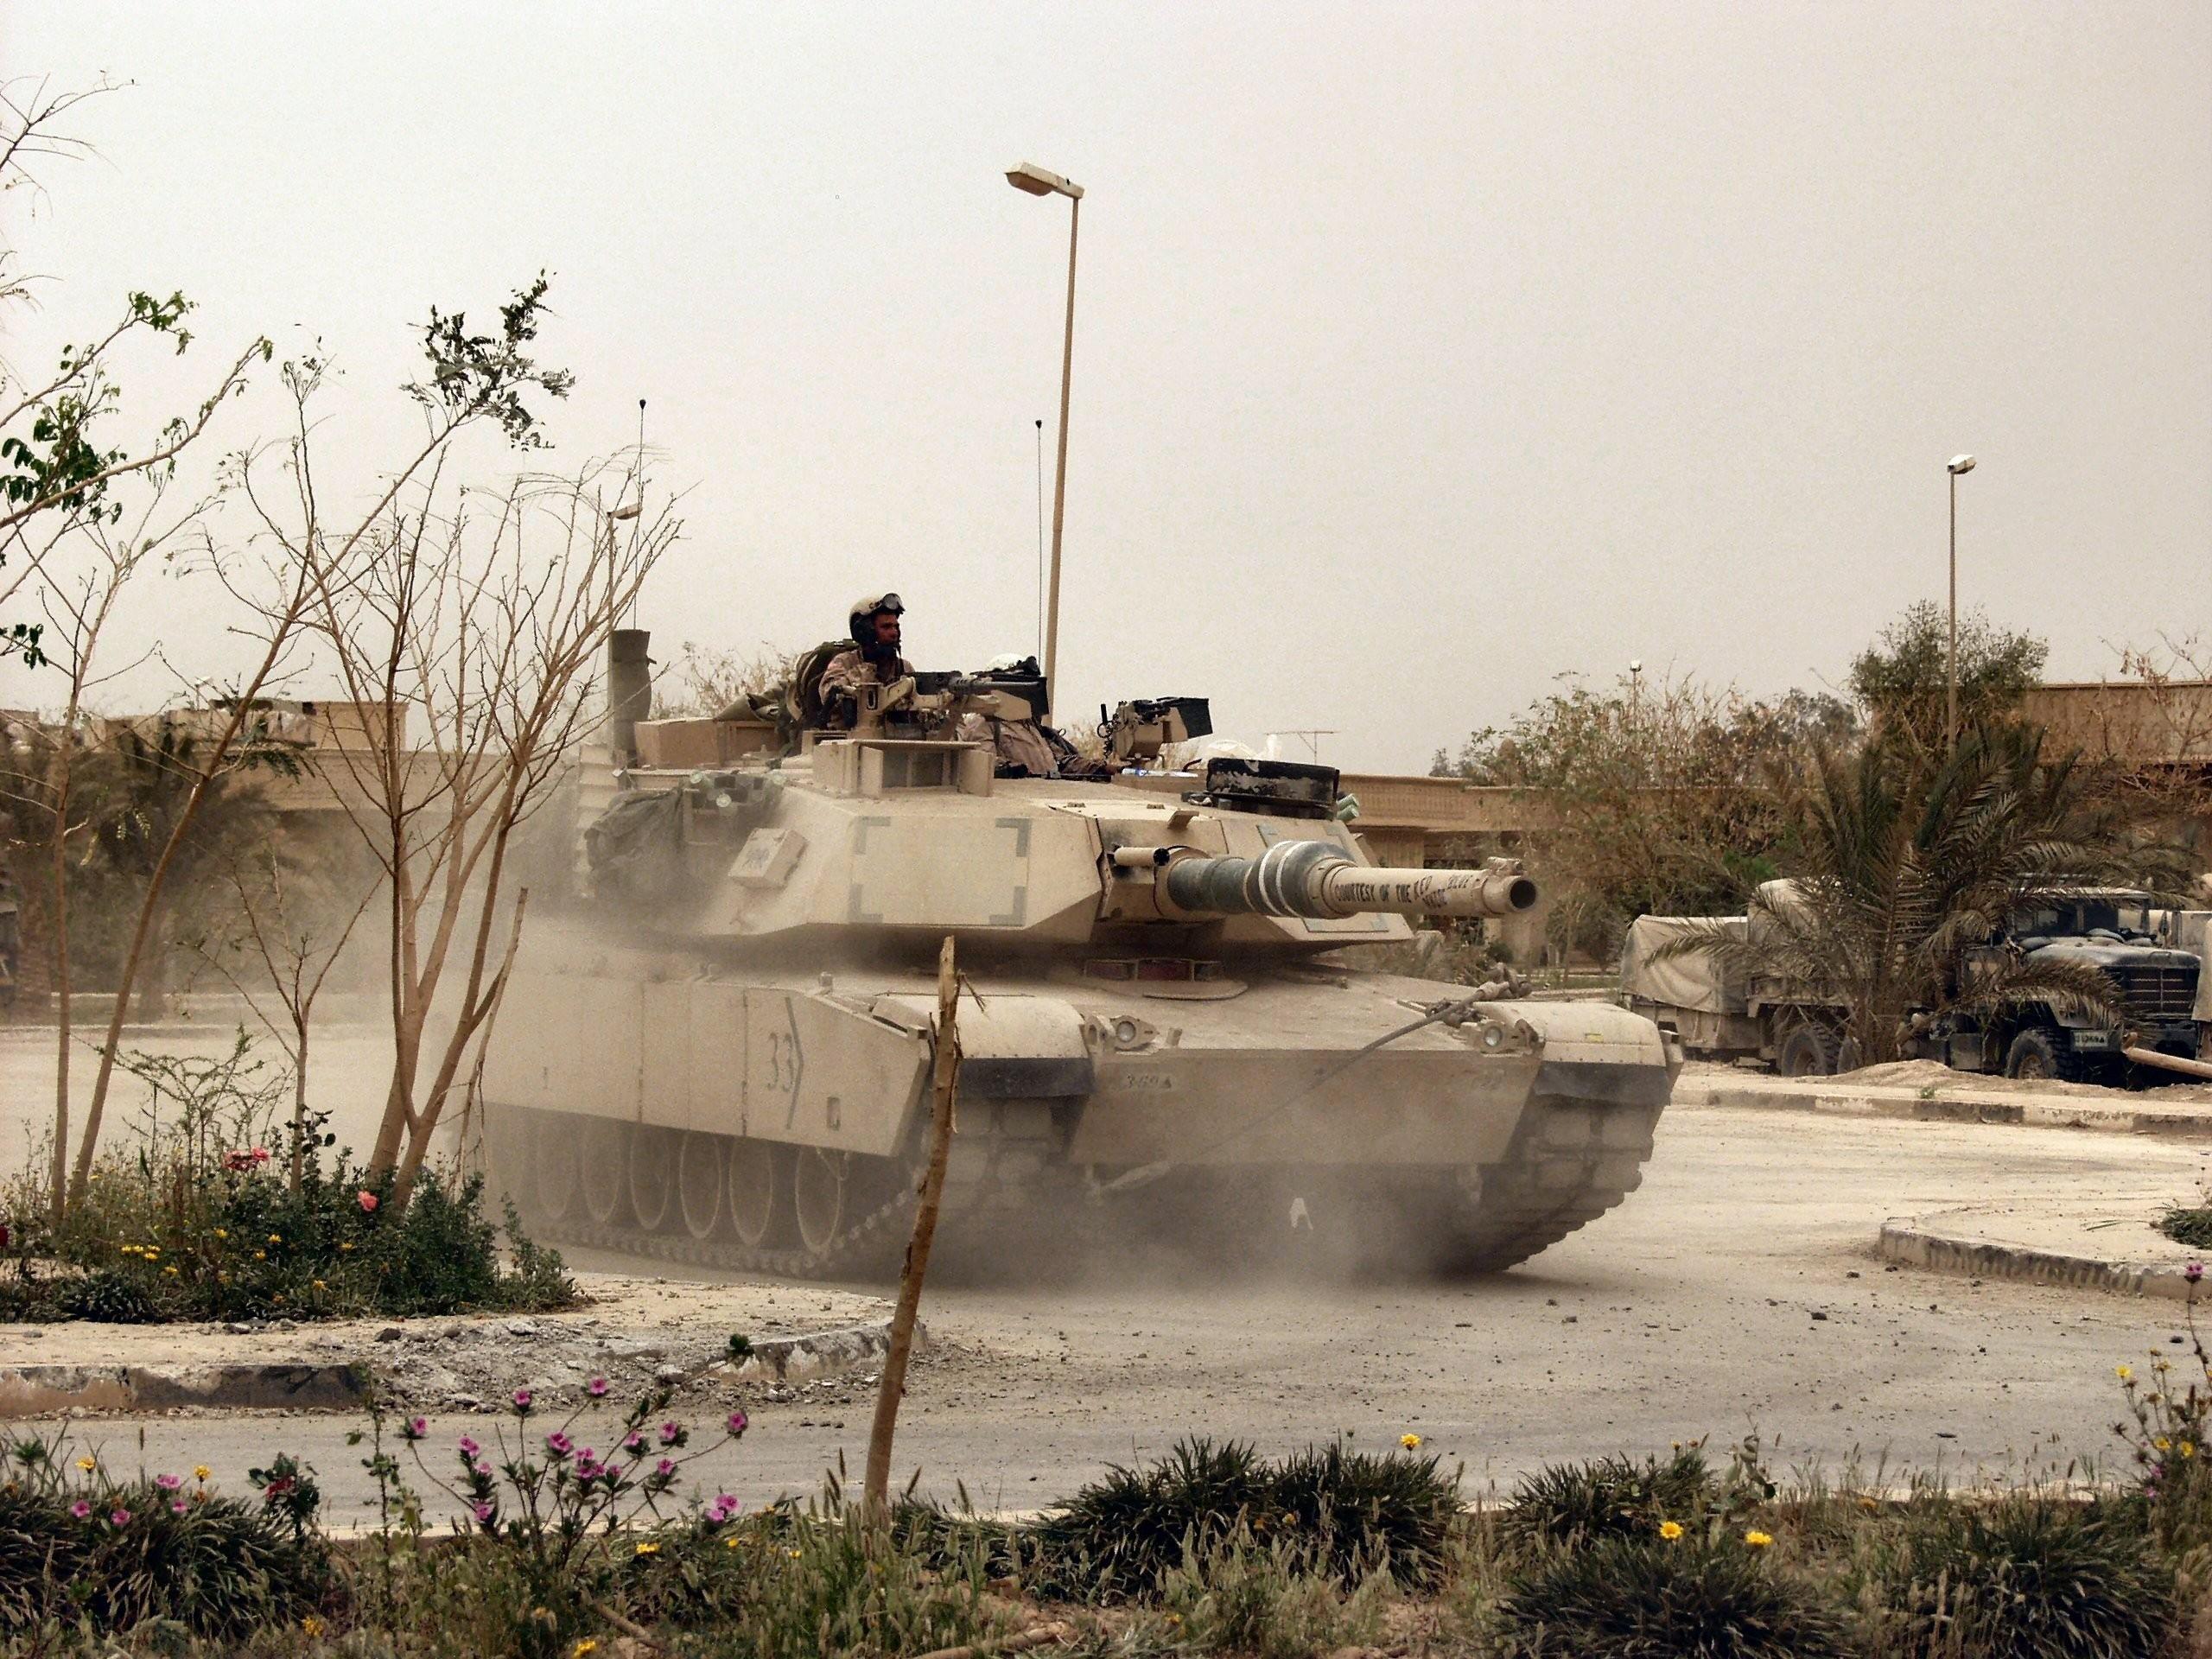 war sand army military deserts Abrams warfare fight tanks USA armored dust  terror combat armor Iraq